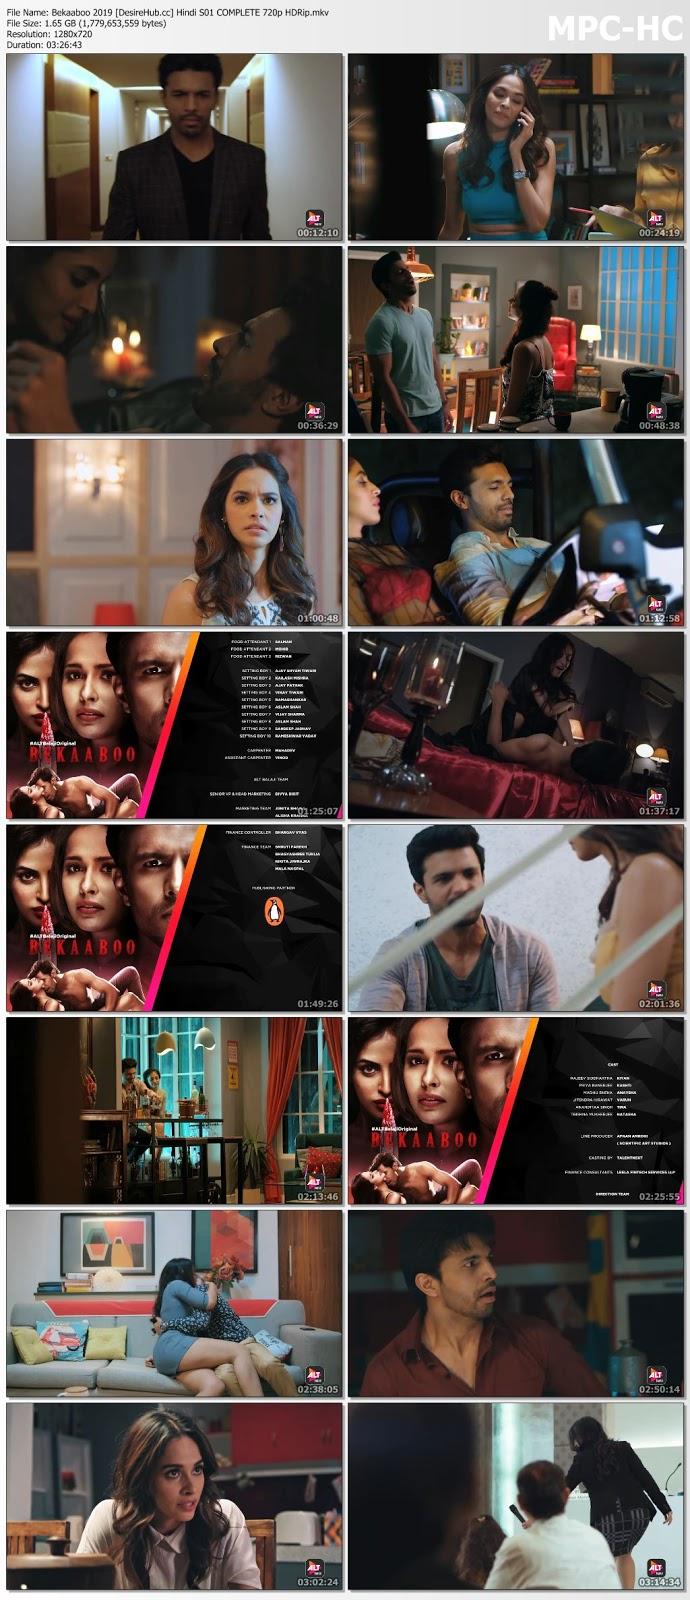 Bekaaboo 2019 Hindi S01 Complete 720p HDRip 1.7GB Desirehub